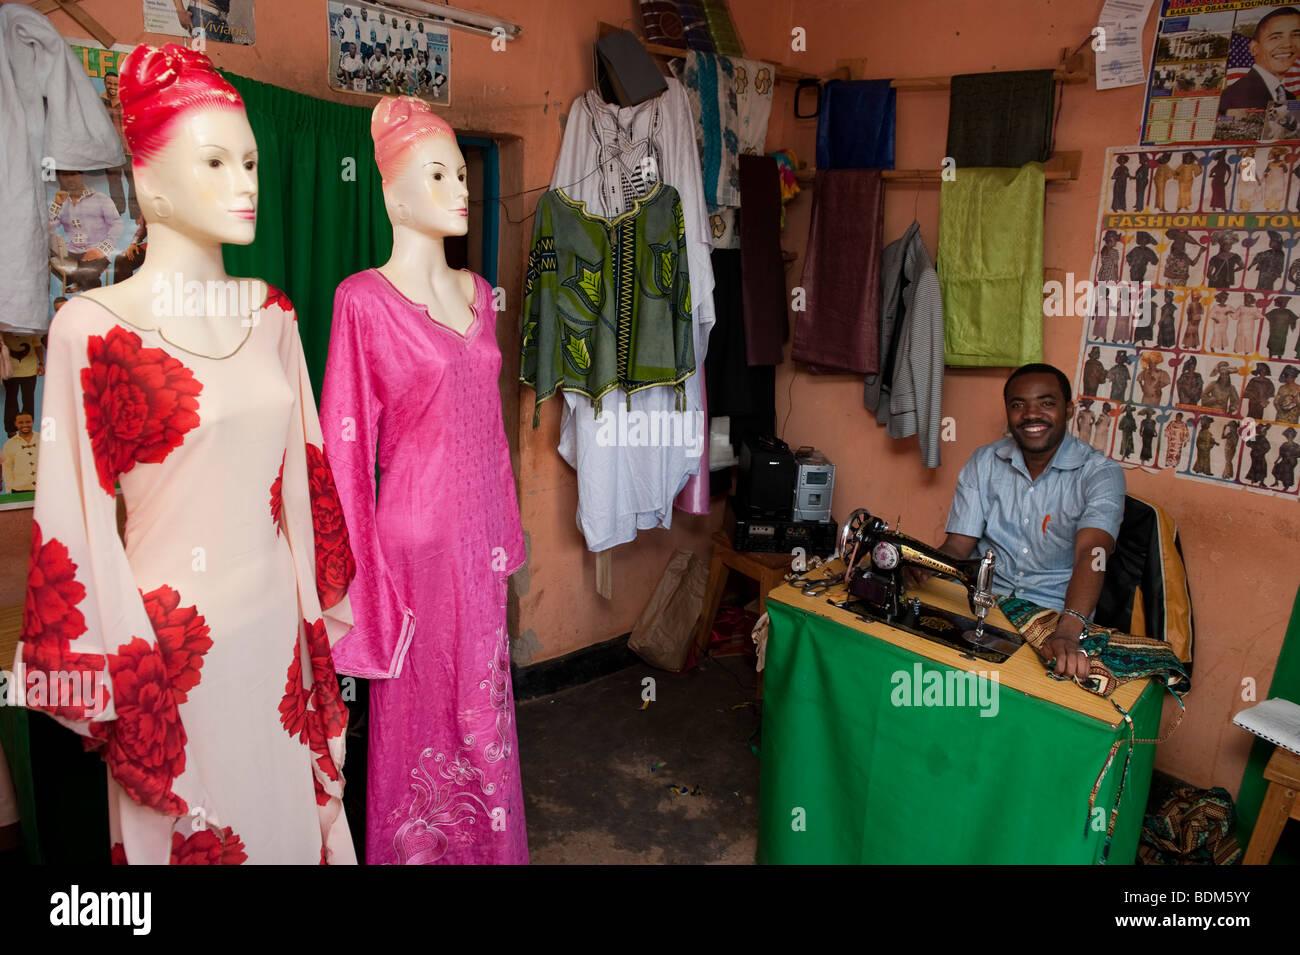 Tailor, Kigali, Rwanda - Stock Image